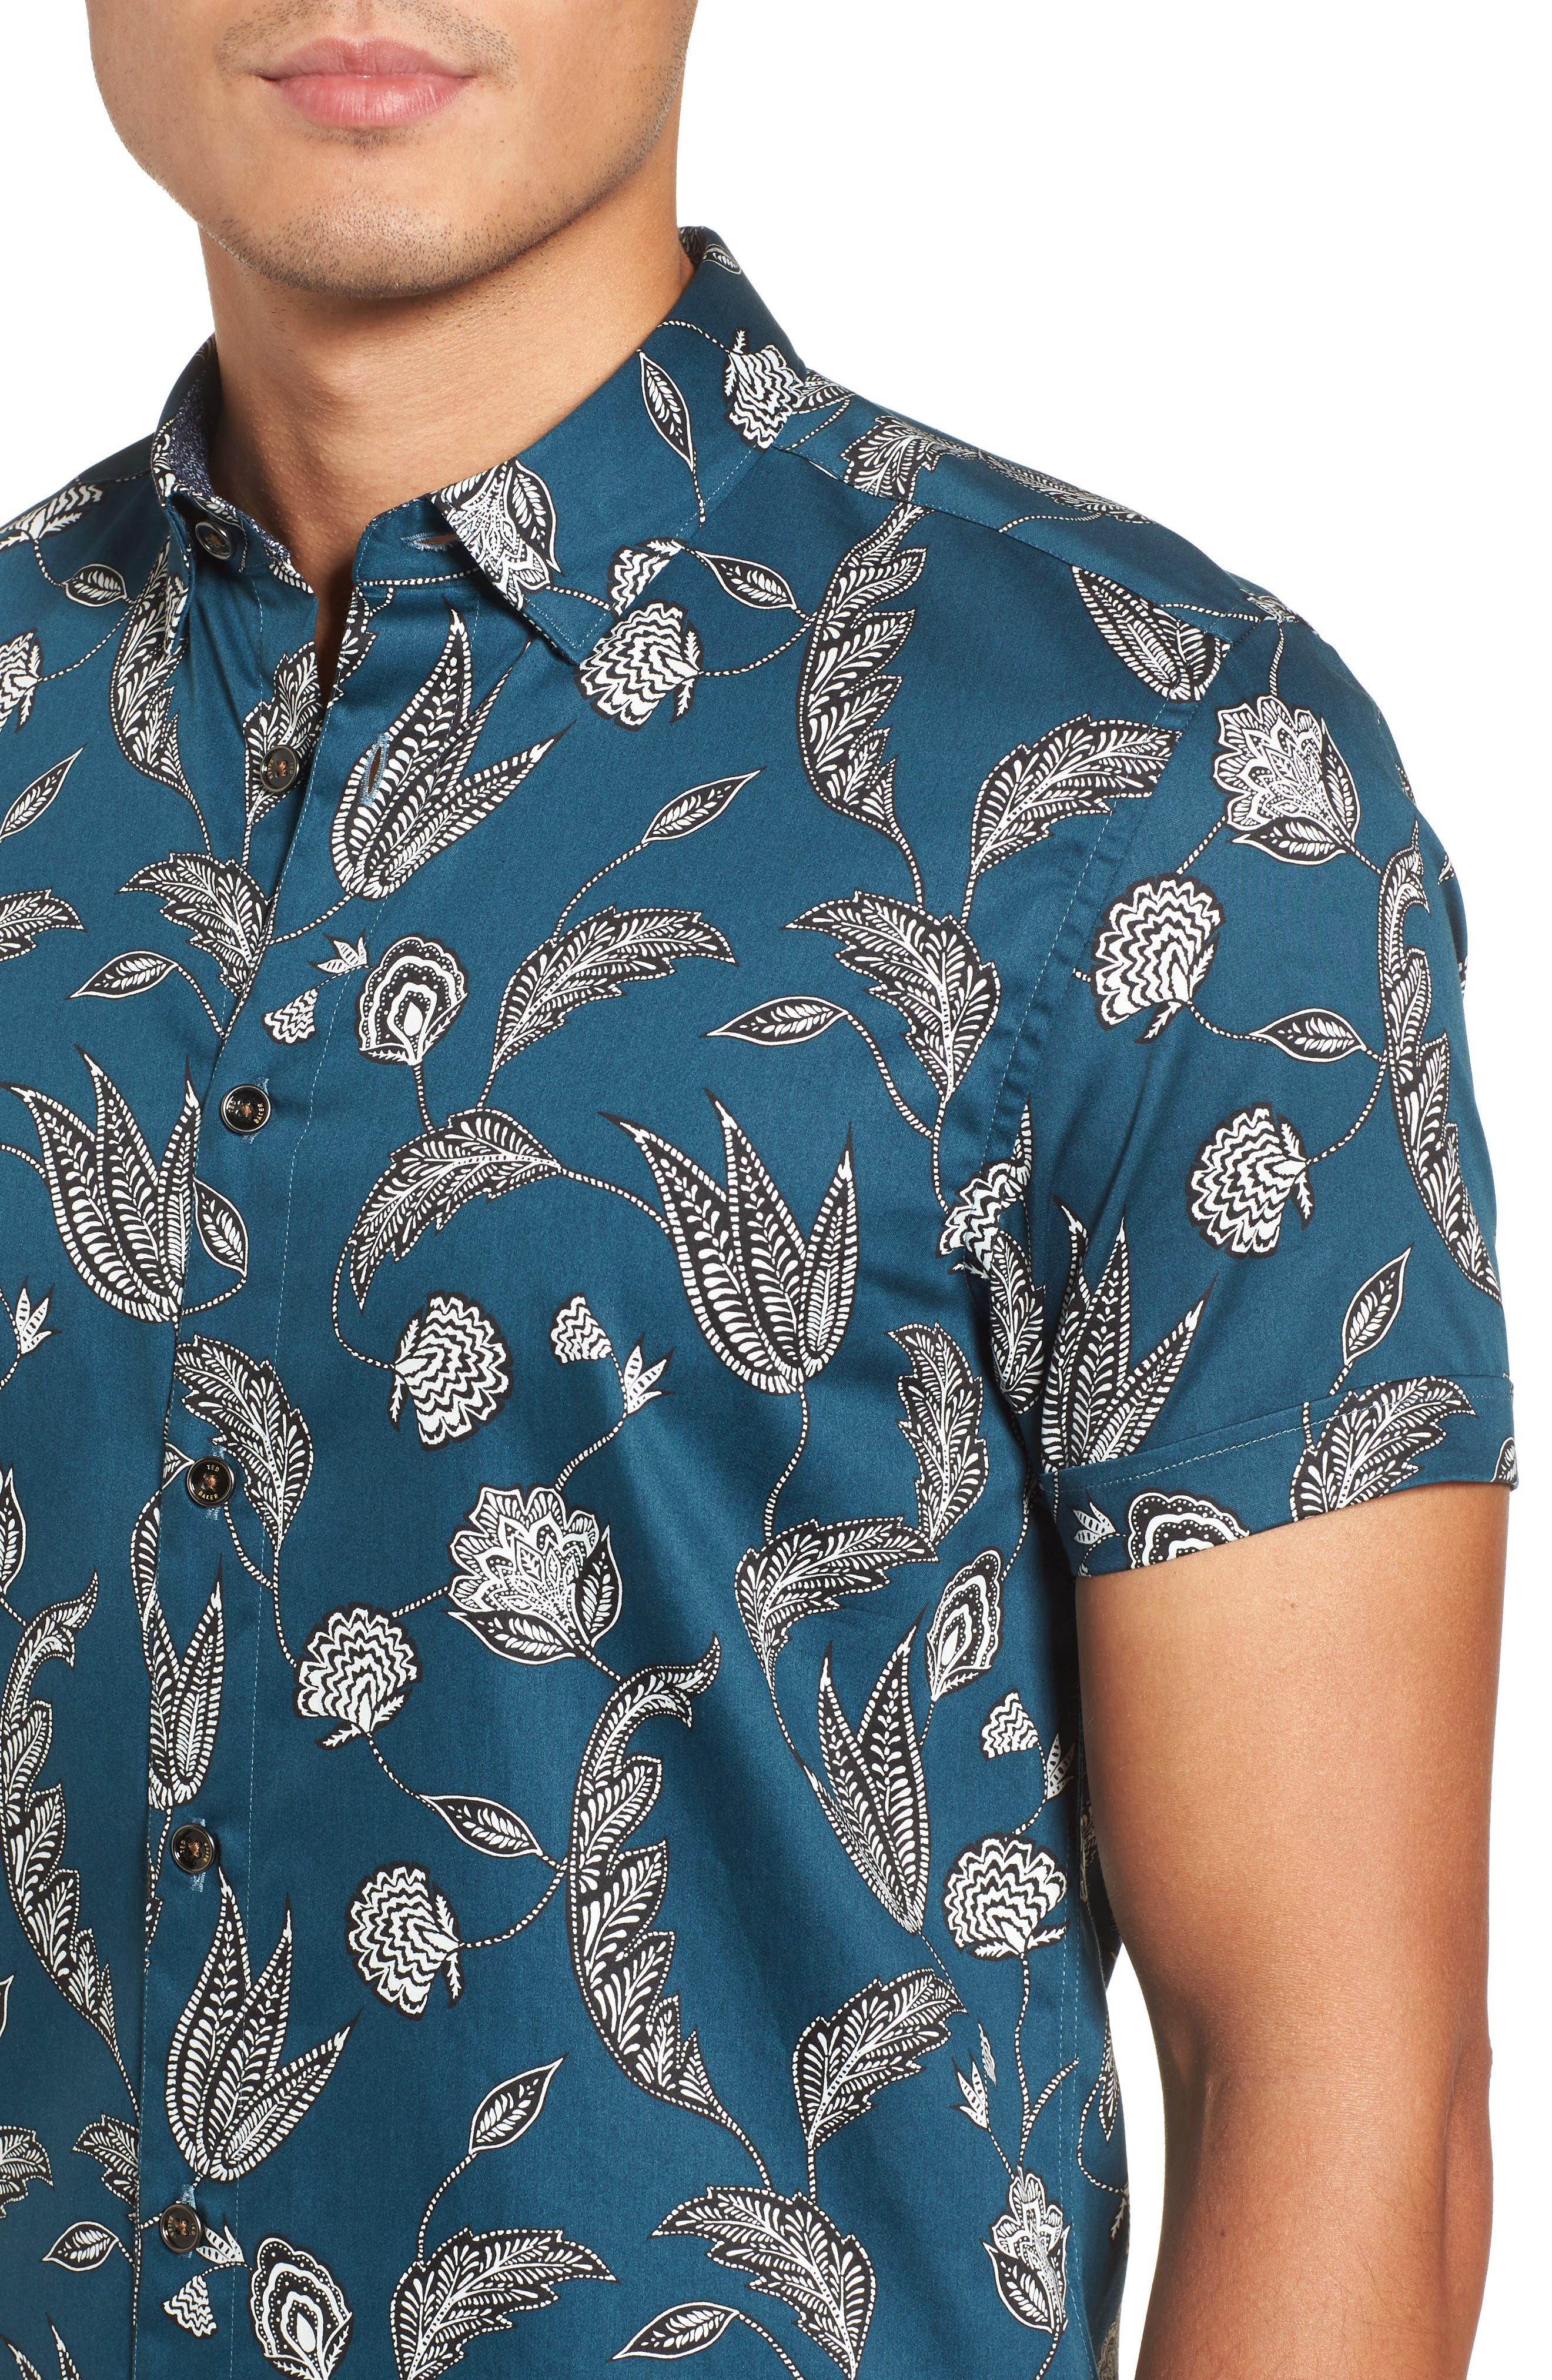 UTKU Floral Sport Shirt,                             Alternate thumbnail 4, color,                             Dark Green